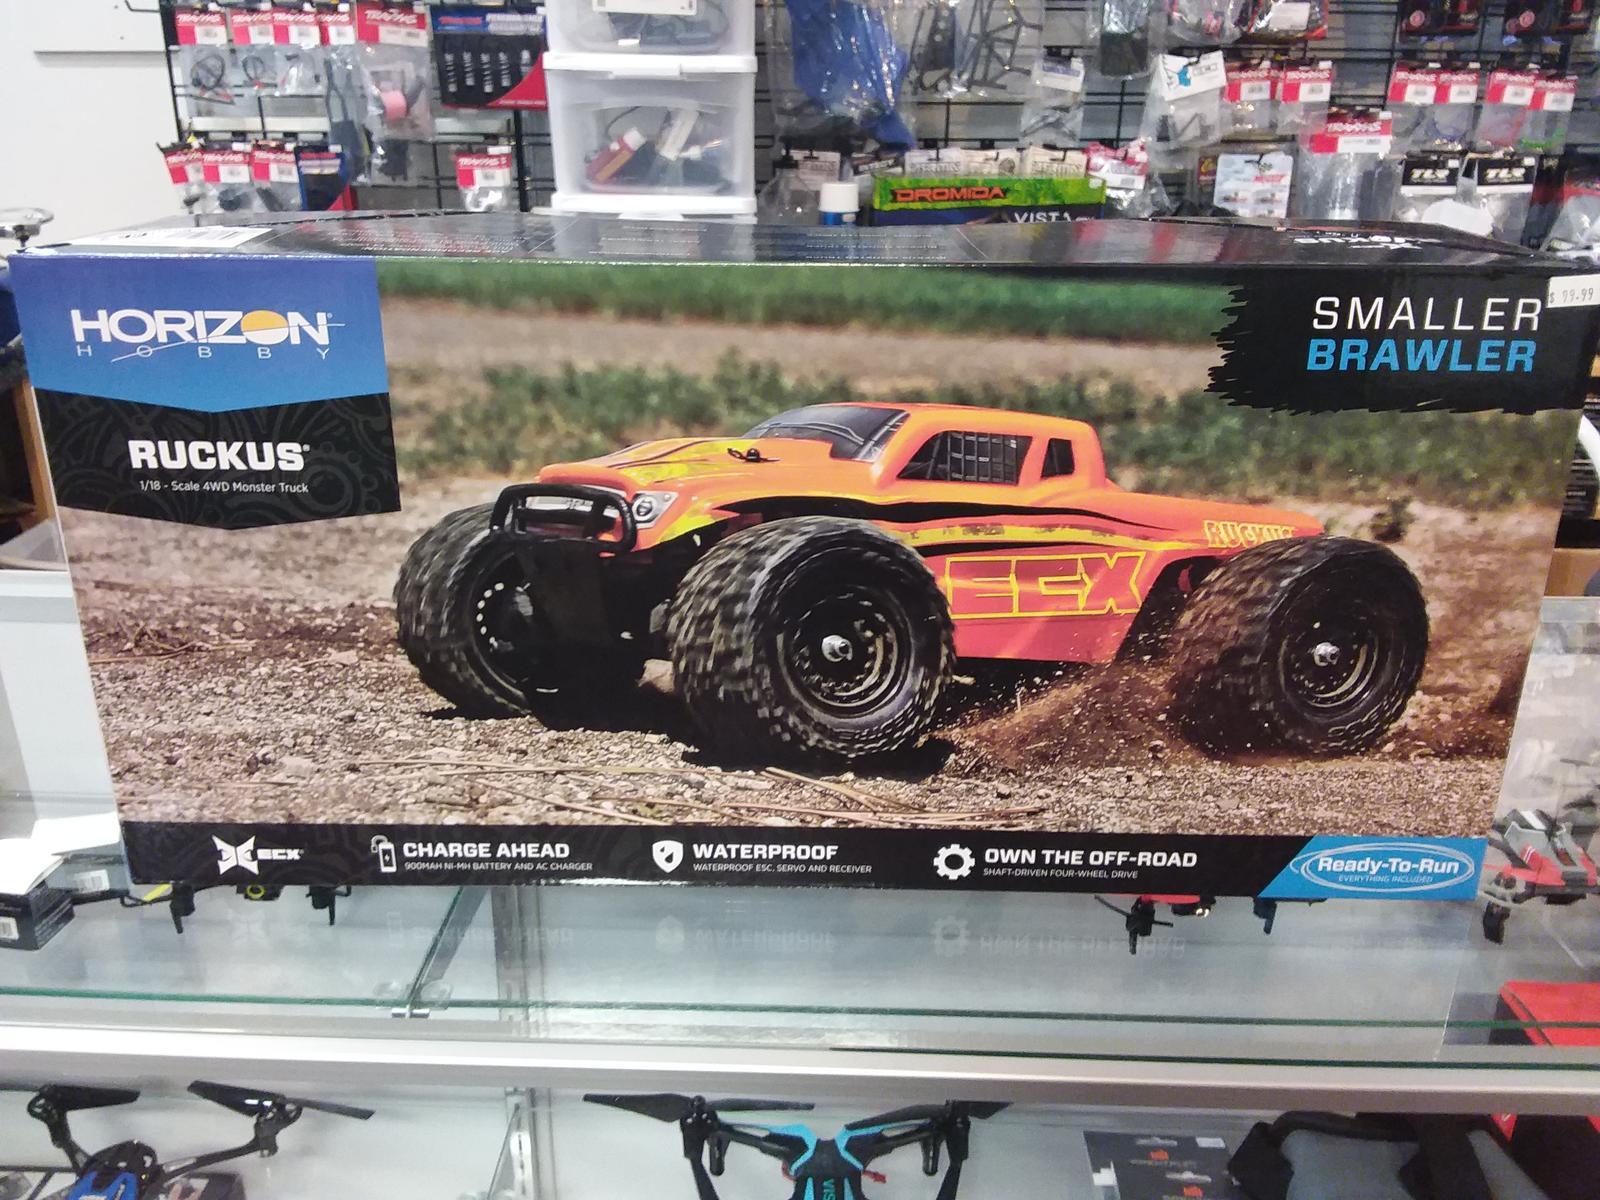 Horizon Hobby 1 18 Ruckus 4WD Monster Truck RTR Black Red ECX T1 $99